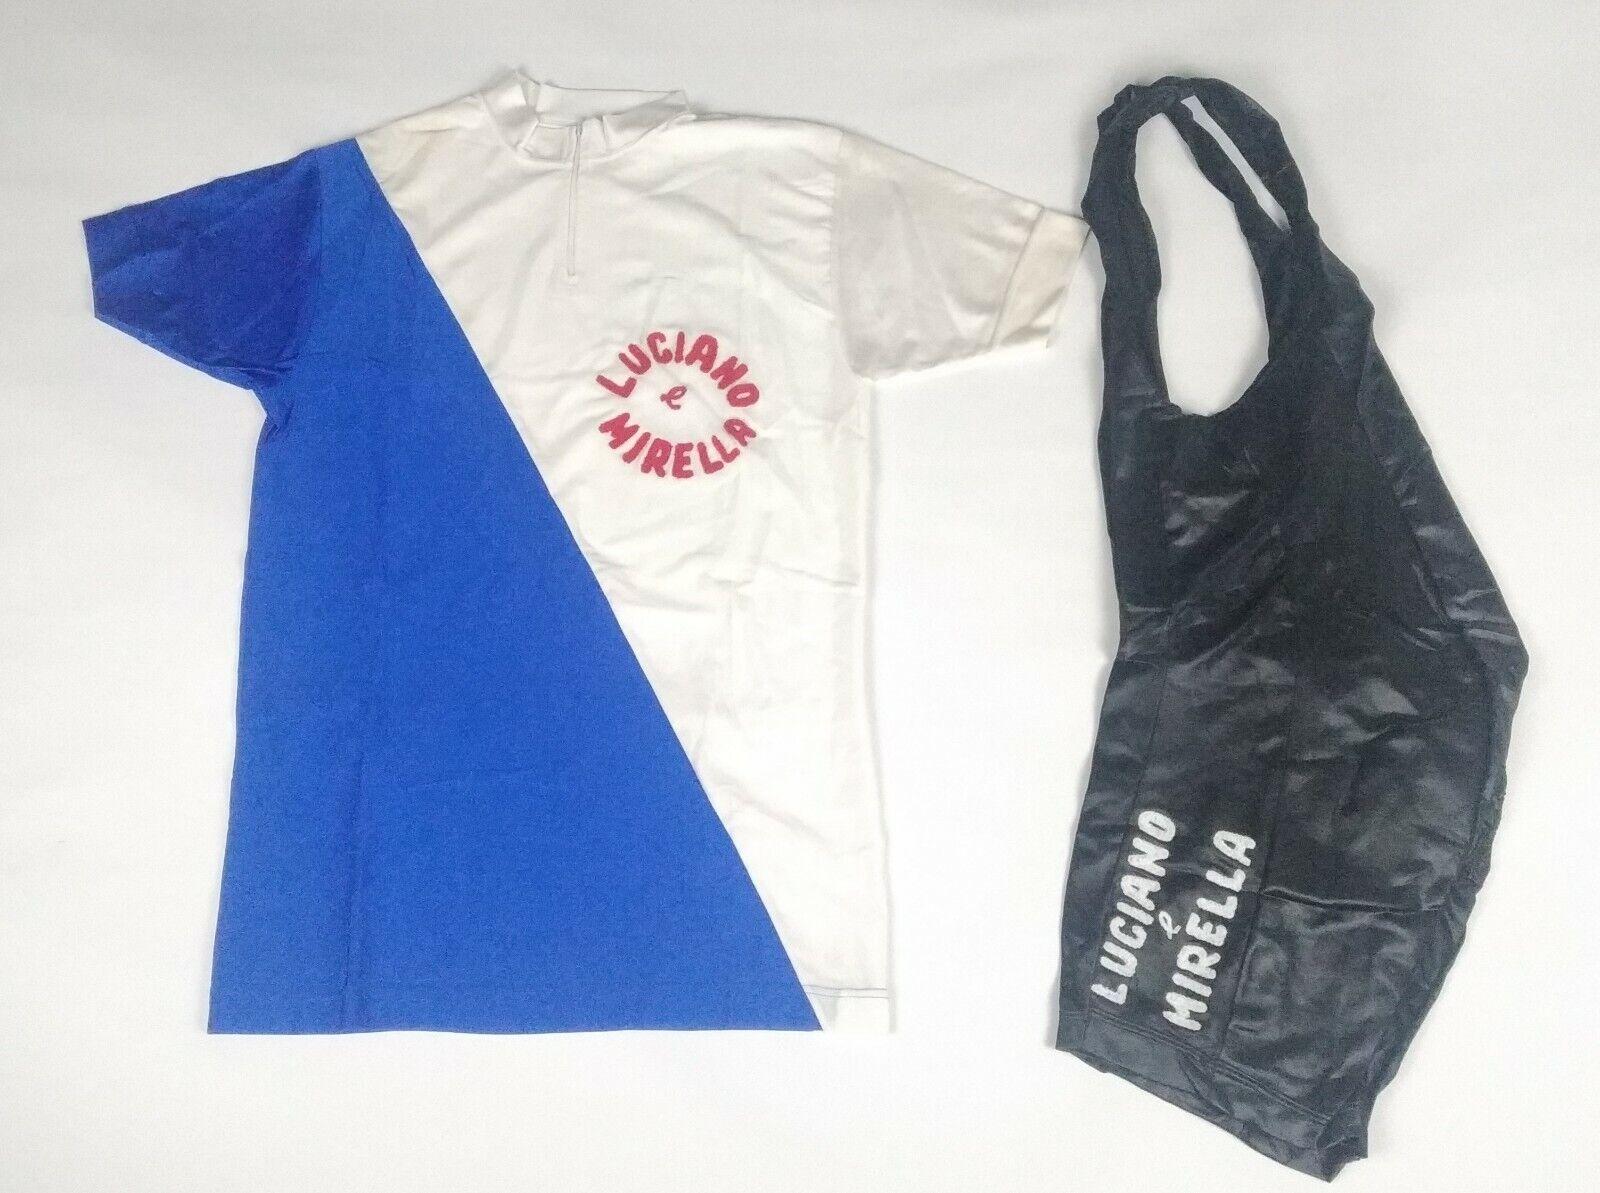 Vintage NOS ciclismo Cycling maglia Jersey complet body 3 M Luciano e Mirella